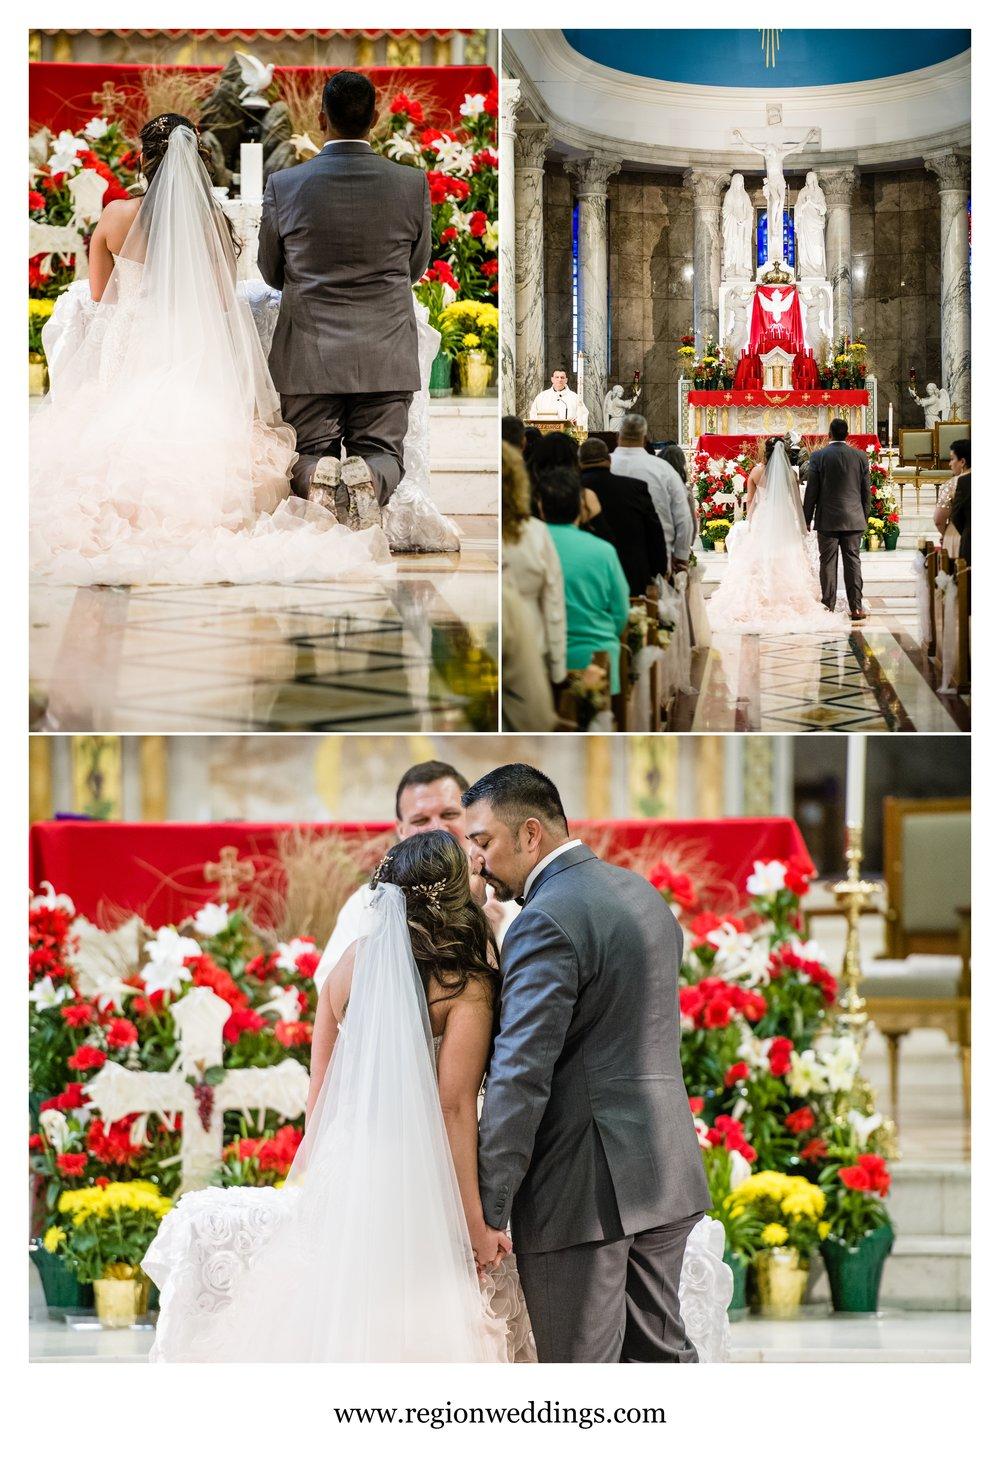 Spring wedding ceremony at St. Anthony's Catholic Church in Chicago, Illinois.